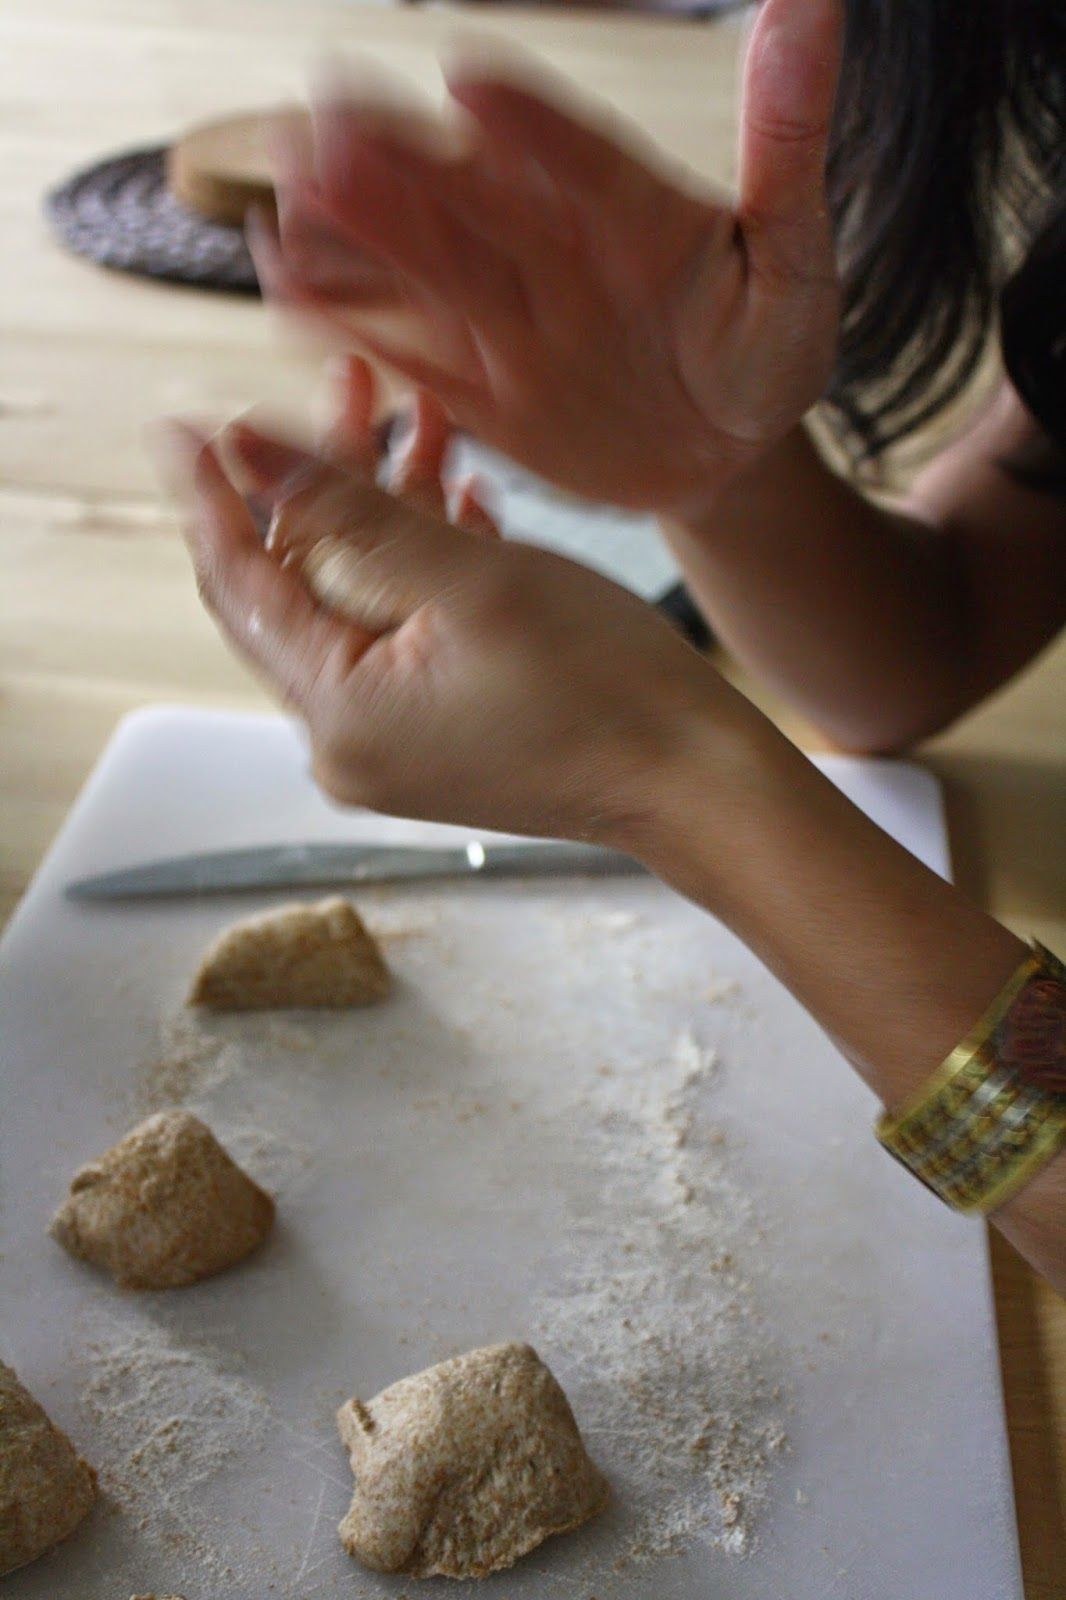 Making roti - recipe for the tasty warm Nepali flatbread